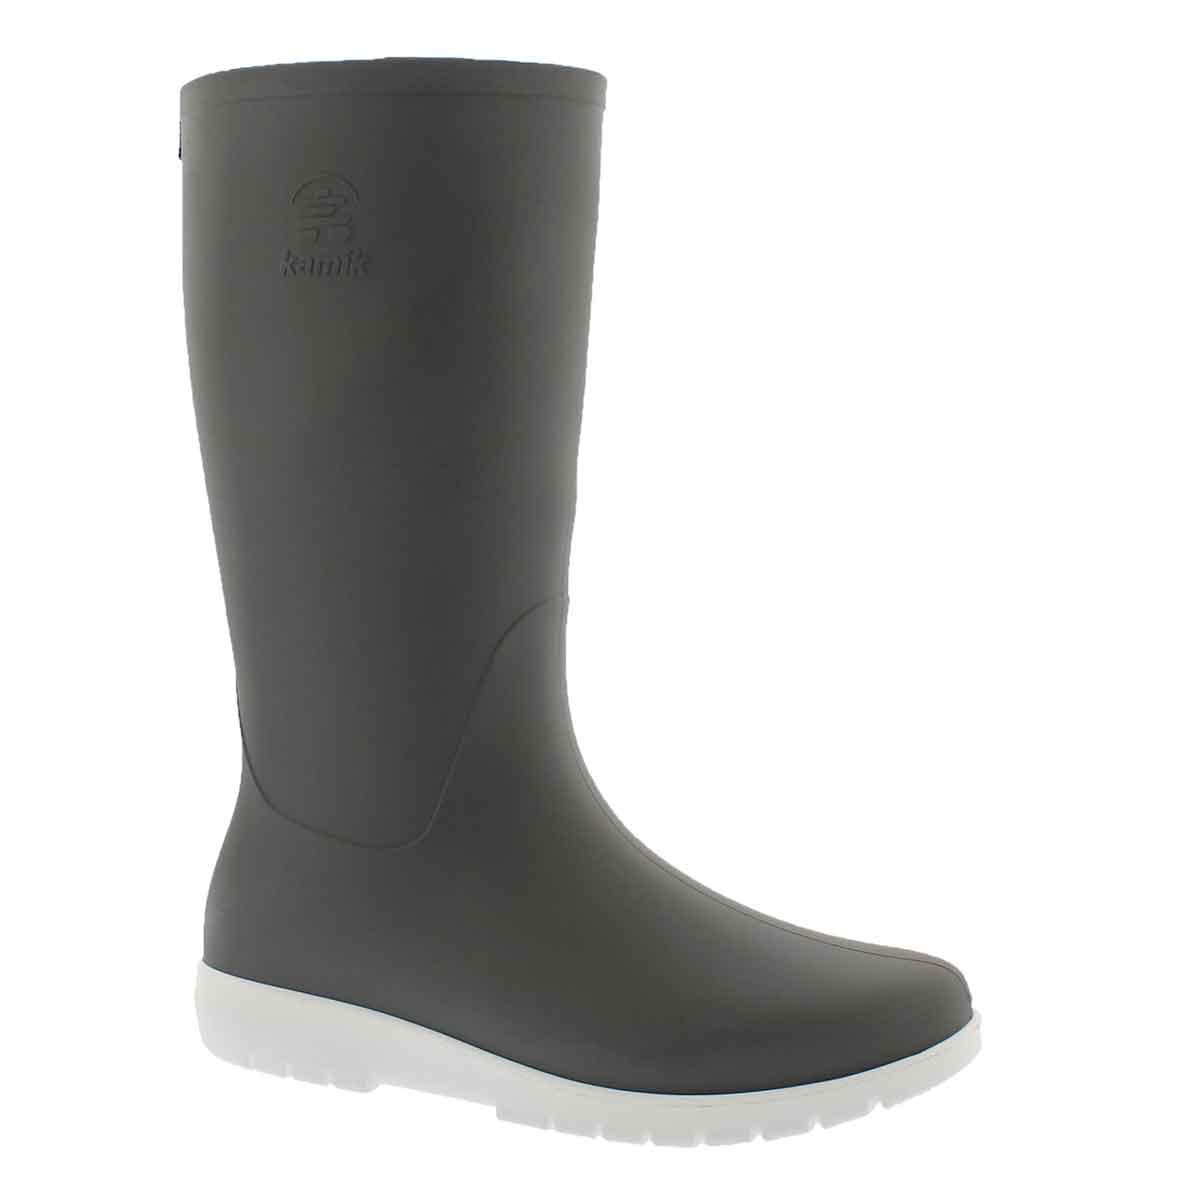 Women's JESSIE charcoal mid waterproof rain boots